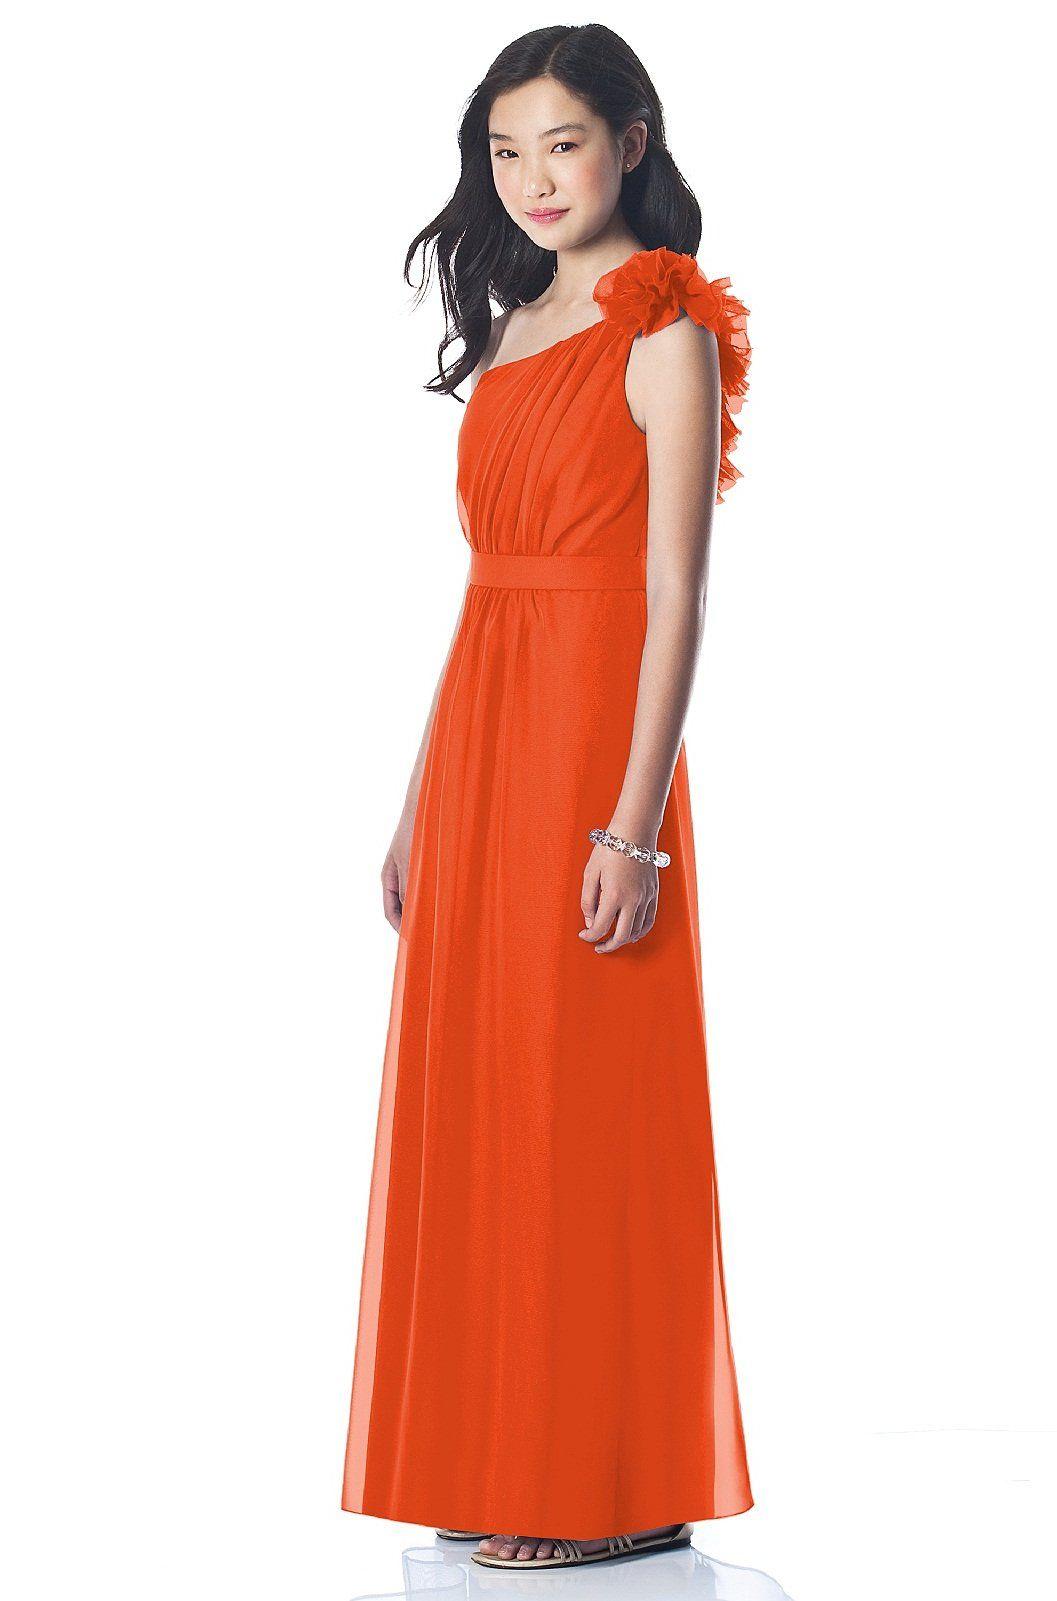 Red dress for wedding reception  tangerine tango  Harley Klopp  Fashion  Pinterest  Tango Party